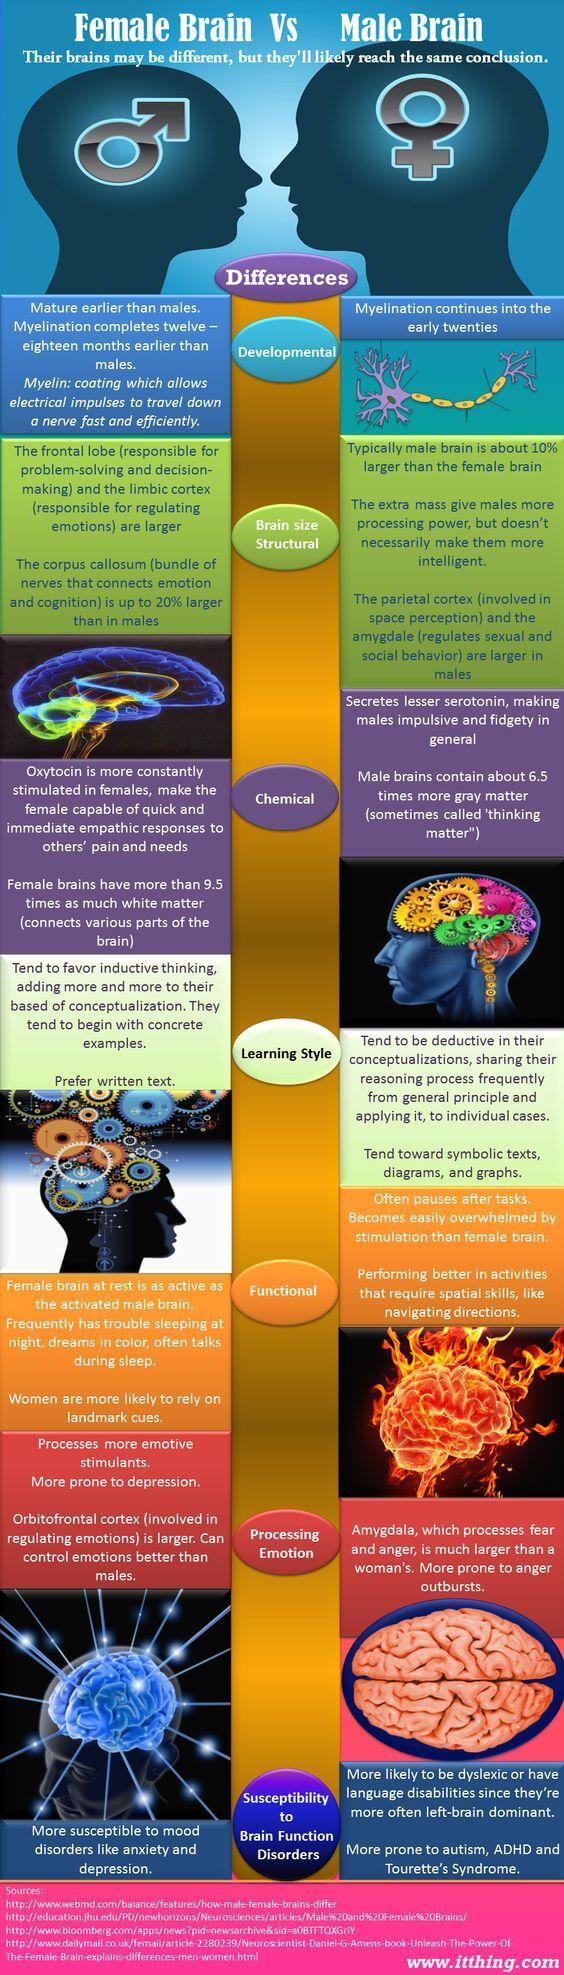 Male brain versus female brain infographic